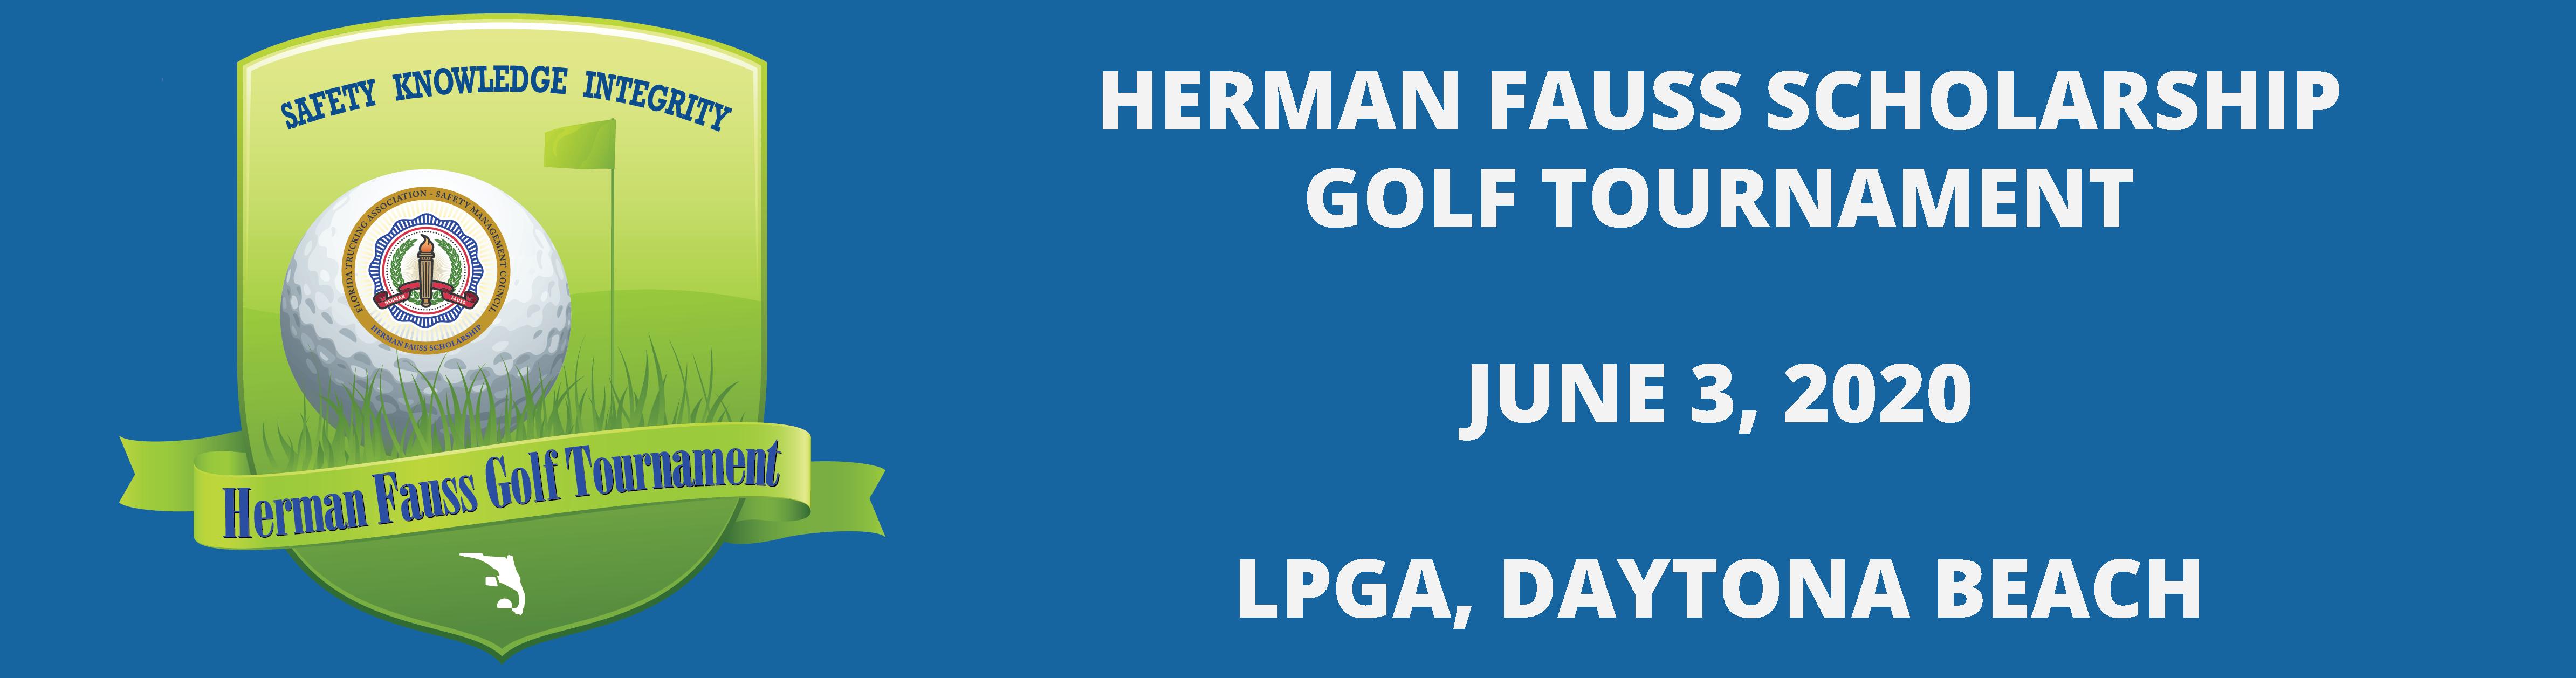 Herman Fauss Scholarship Fund Golf Tournament